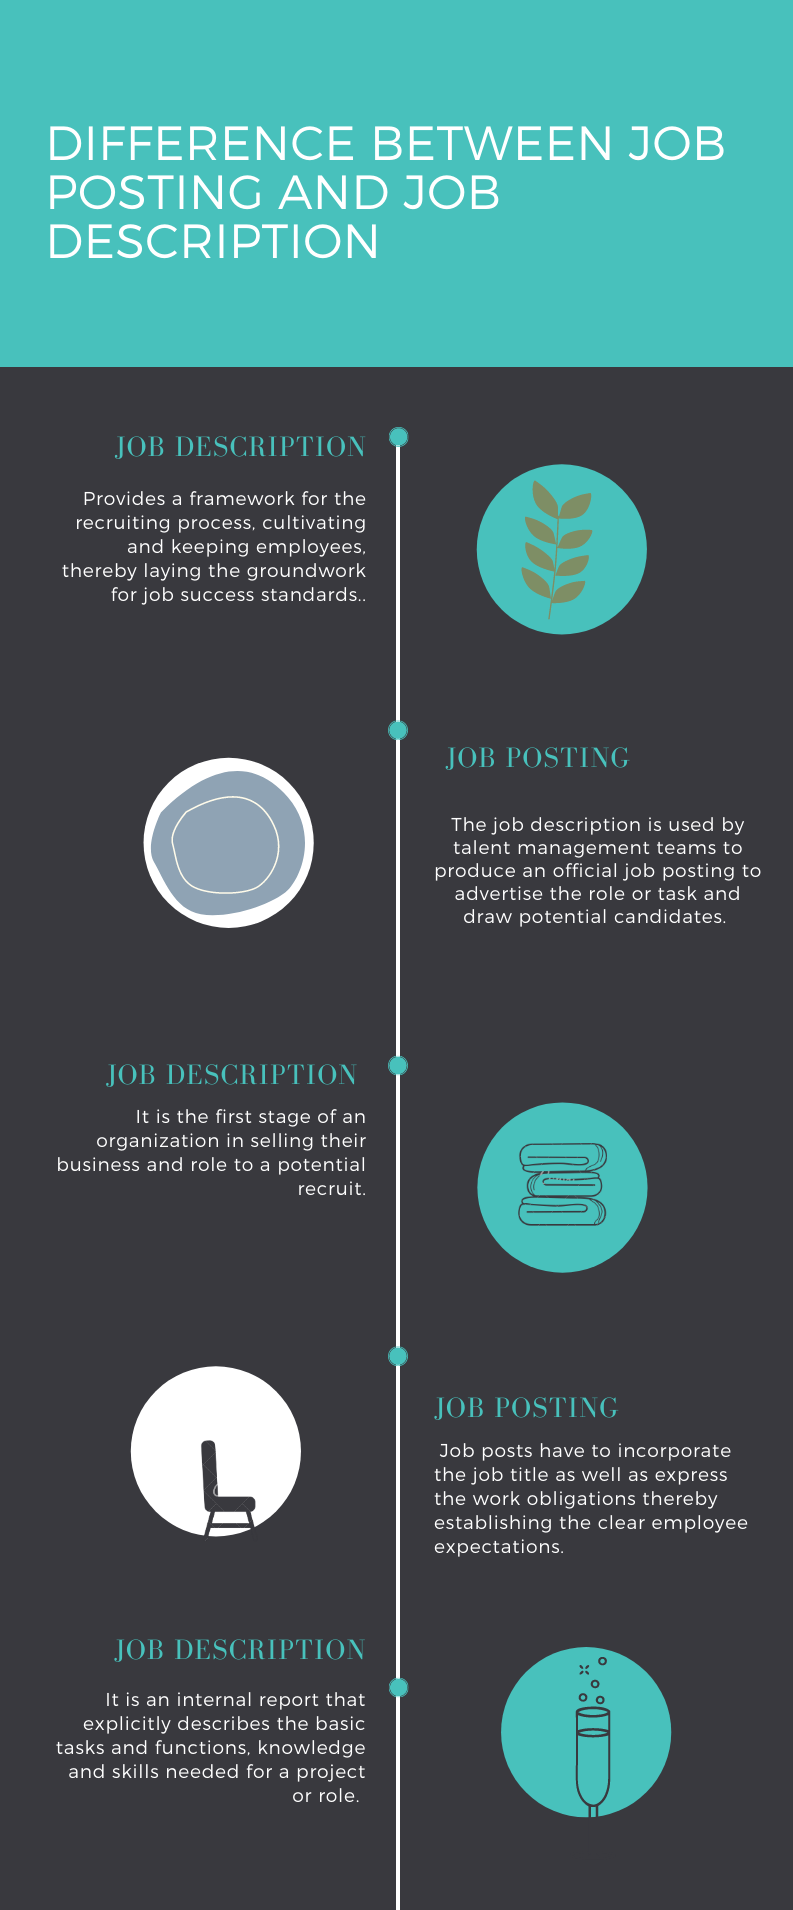 Image for part: Difference between Job posting versus Job description